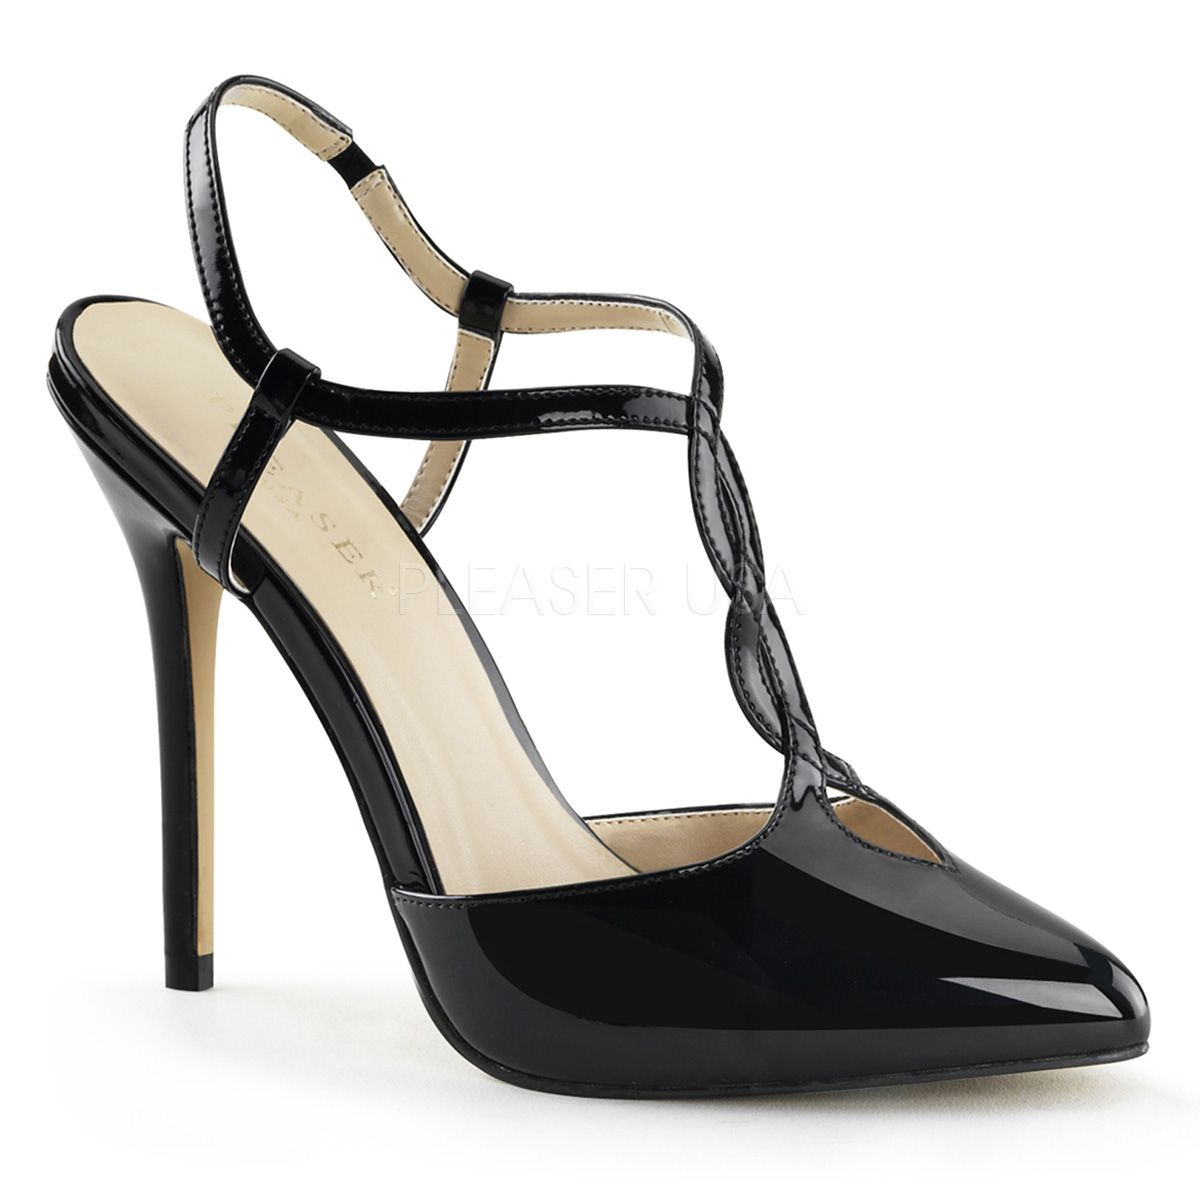 PLEASER Schuhe  AMUSE 16 Fabulicious  Fabulicious 16  highheels http   www 91510c